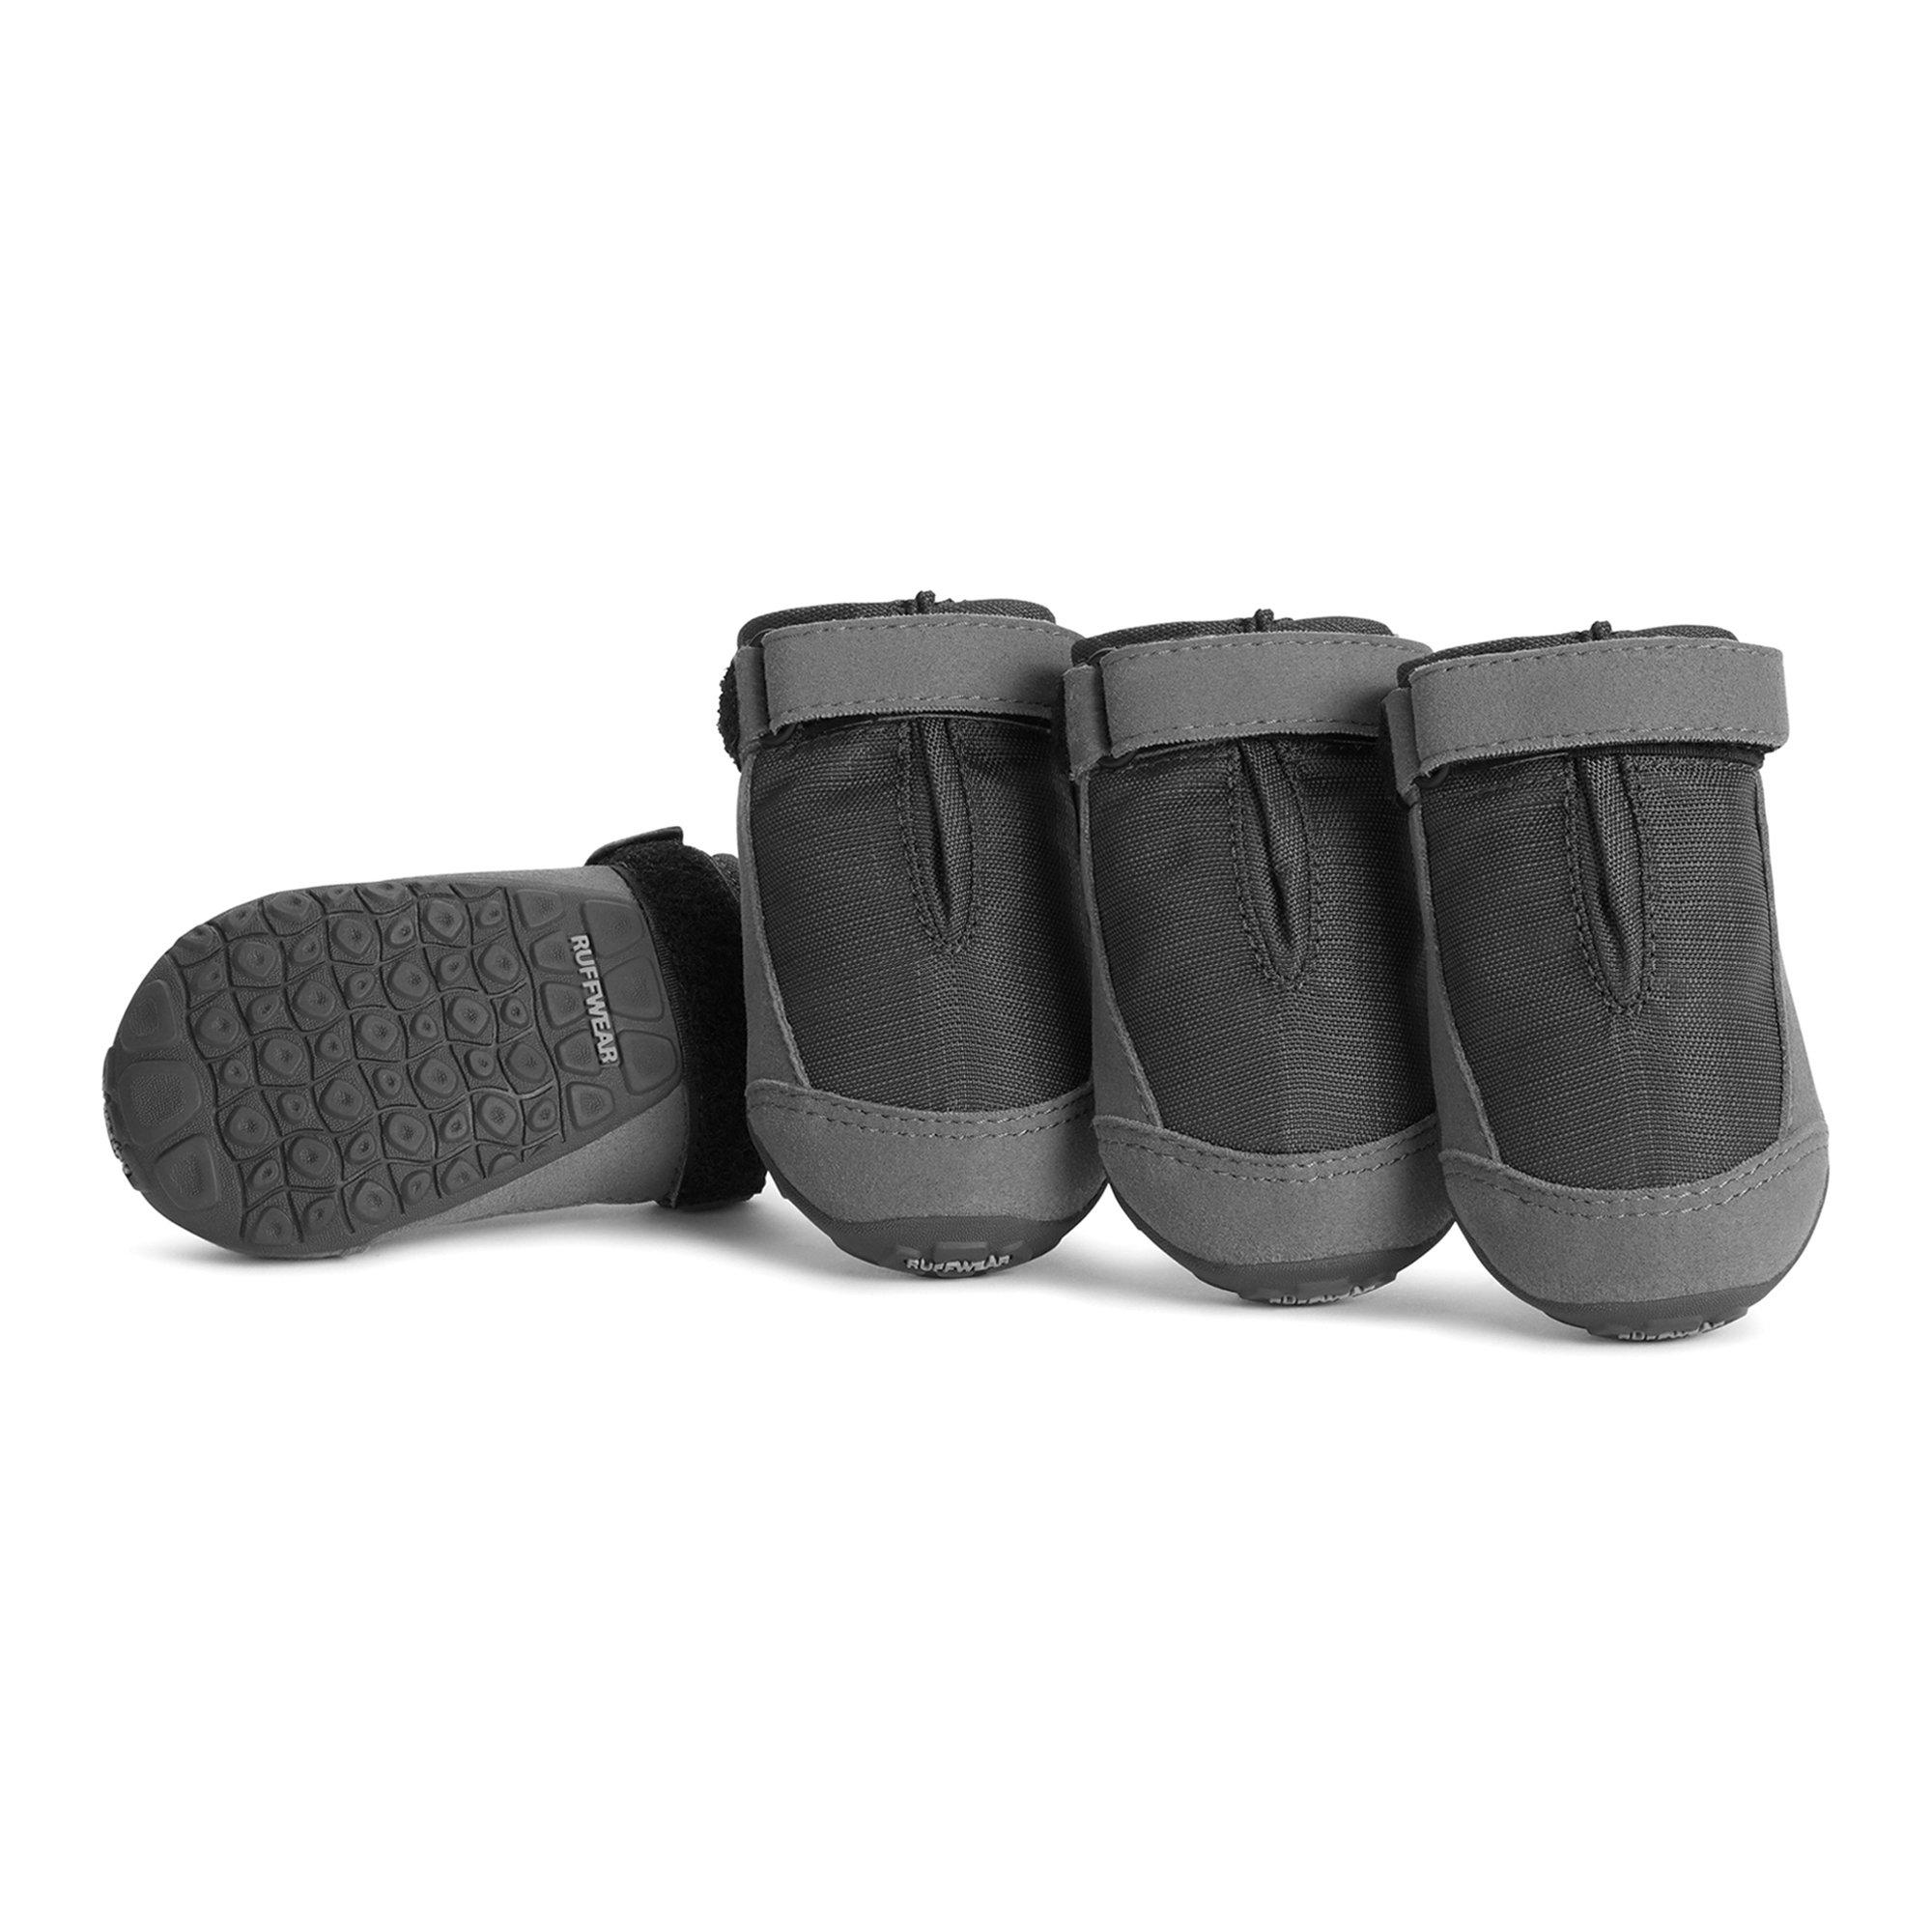 RUFFWEAR - Summit Trex Boots for Dogs, Twilight Gray, 1.5 in (38 mm)